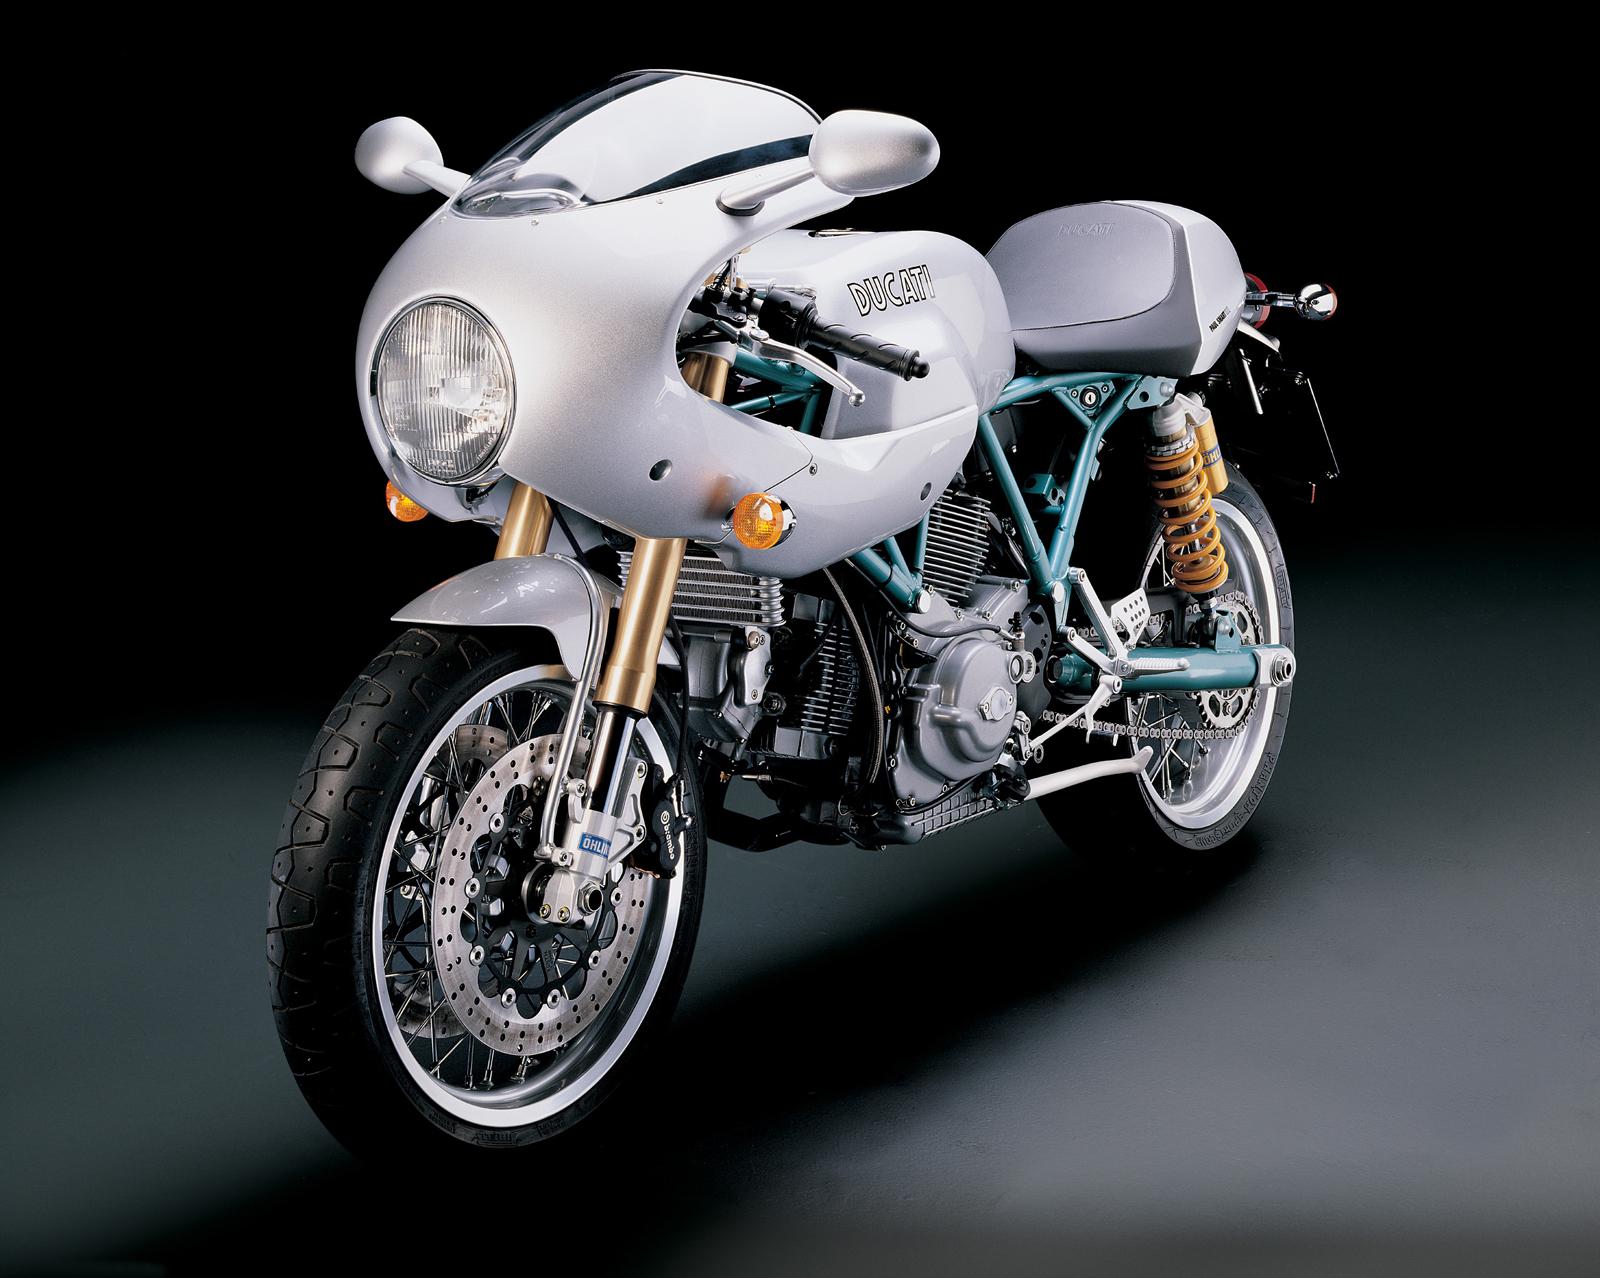 Ducati 848 special edition.